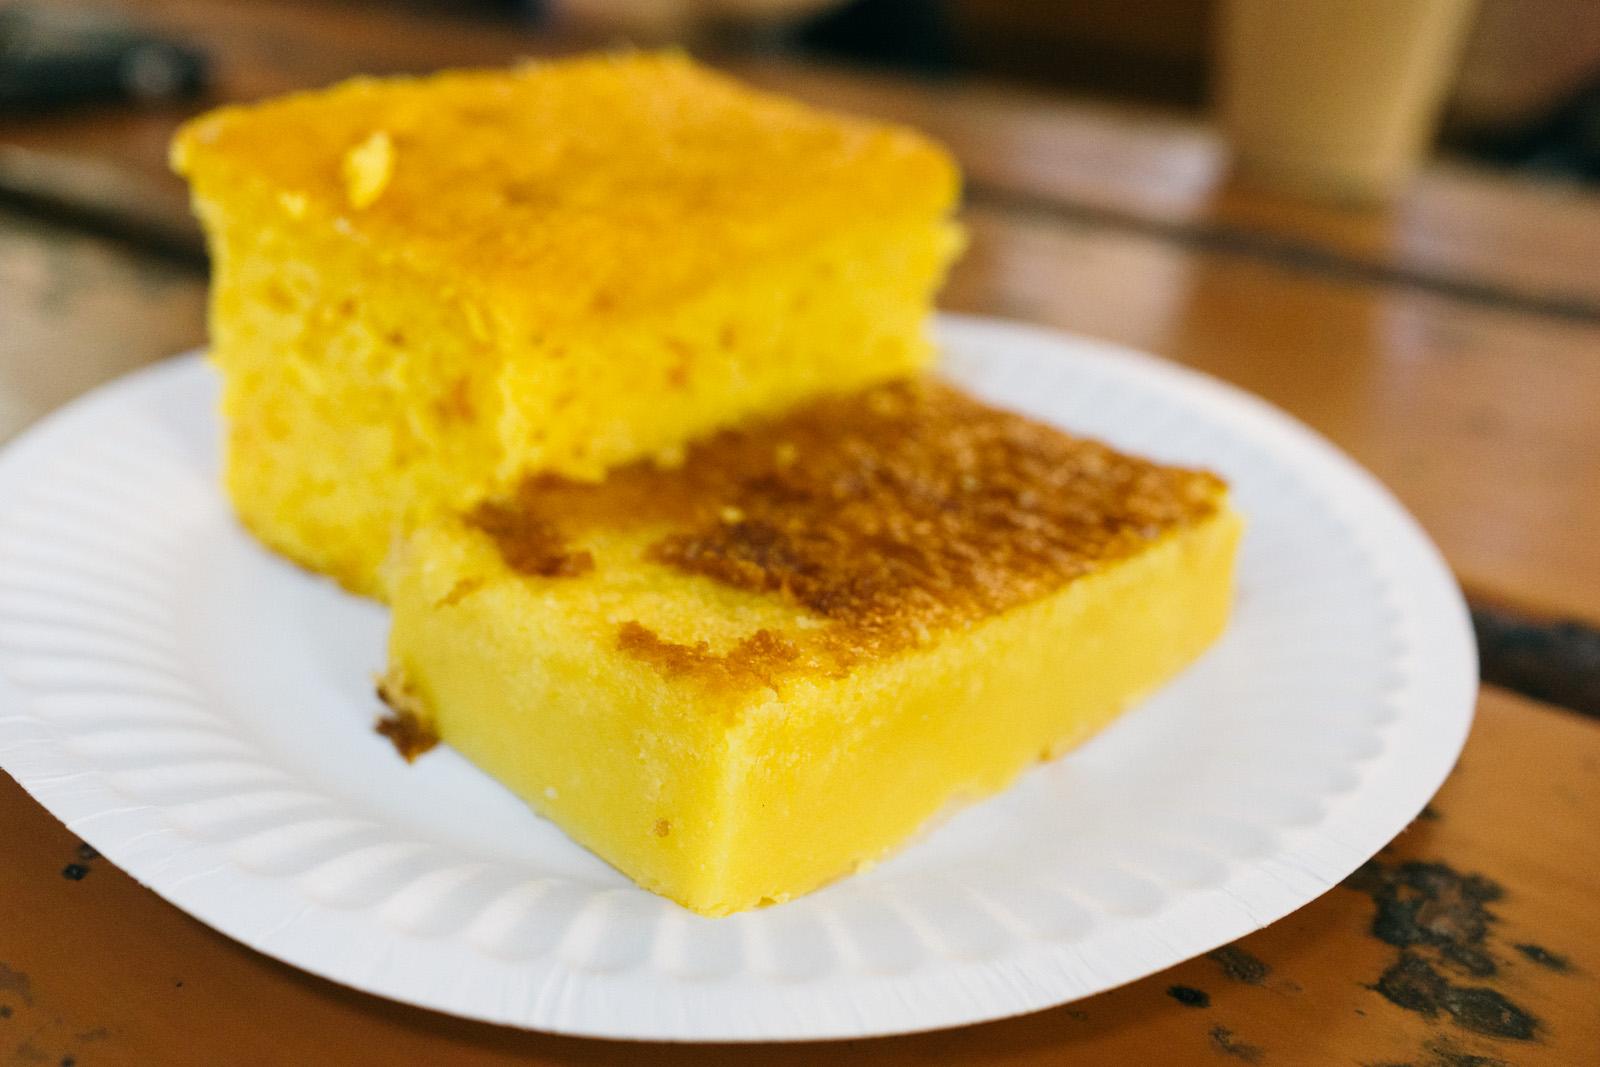 that-food-cray-margarets-cafe-e-nata-macau-portuguese-egg-tarts-4